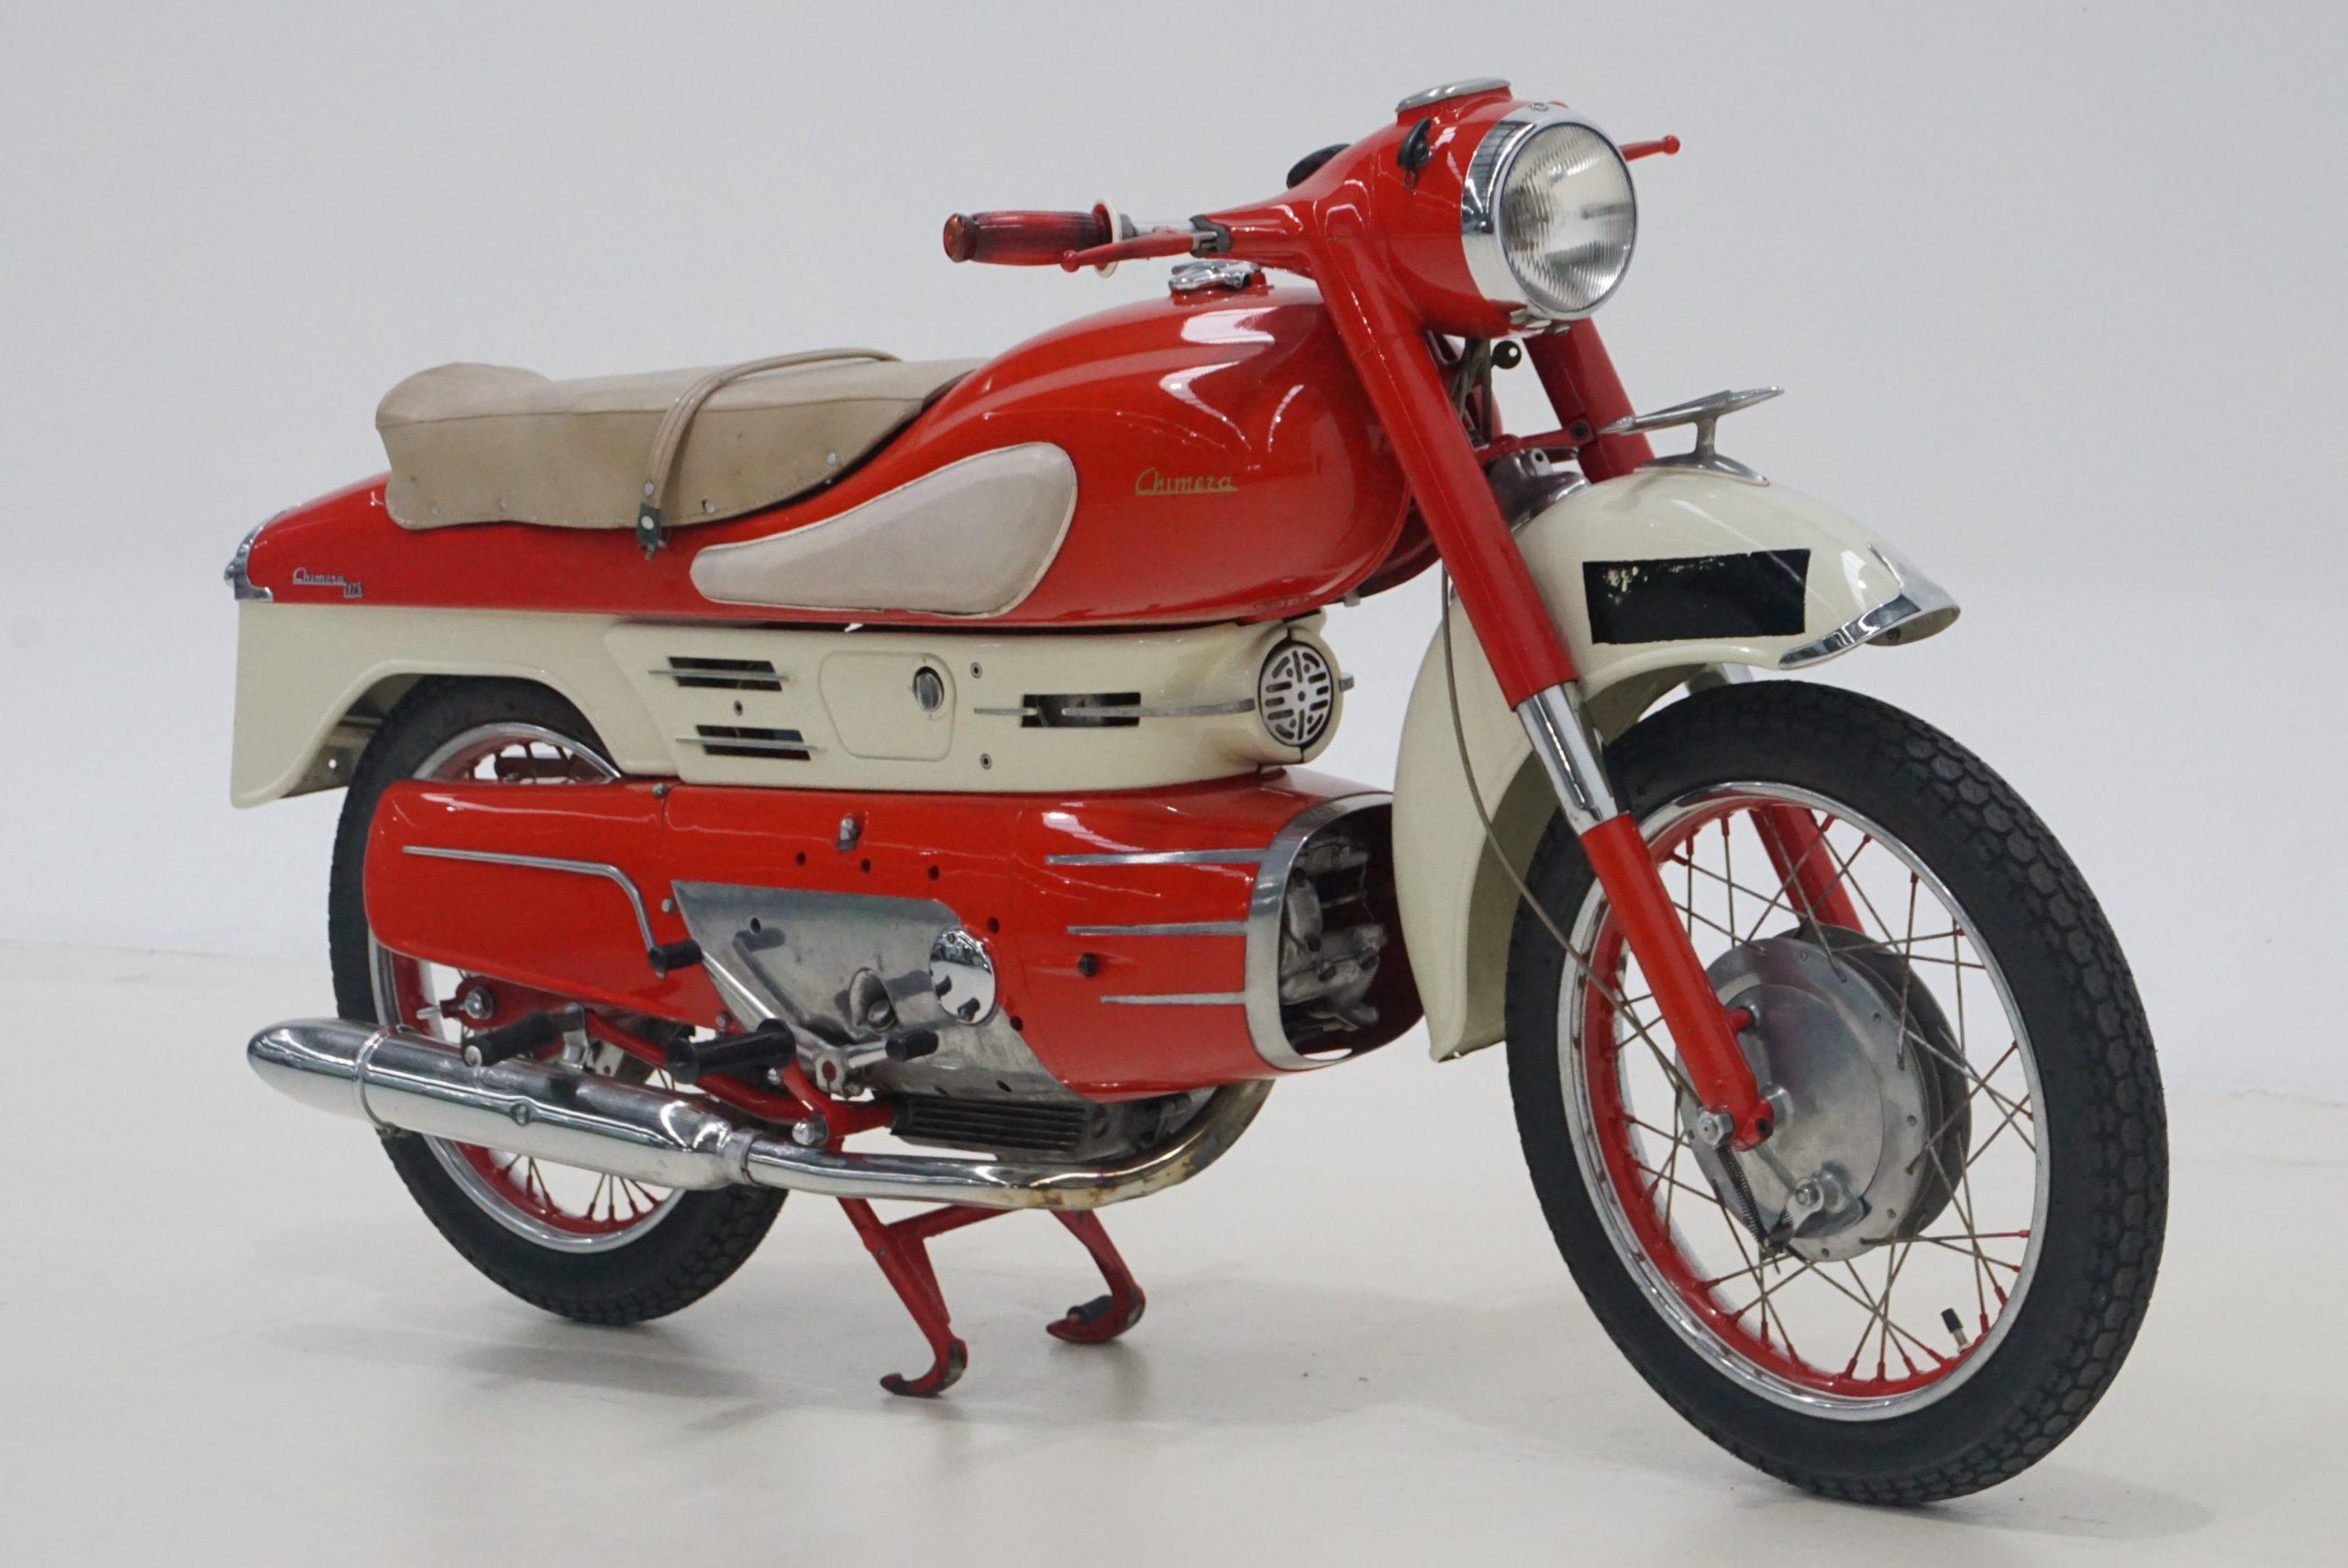 1957 Aermacchi Chimera 175cc